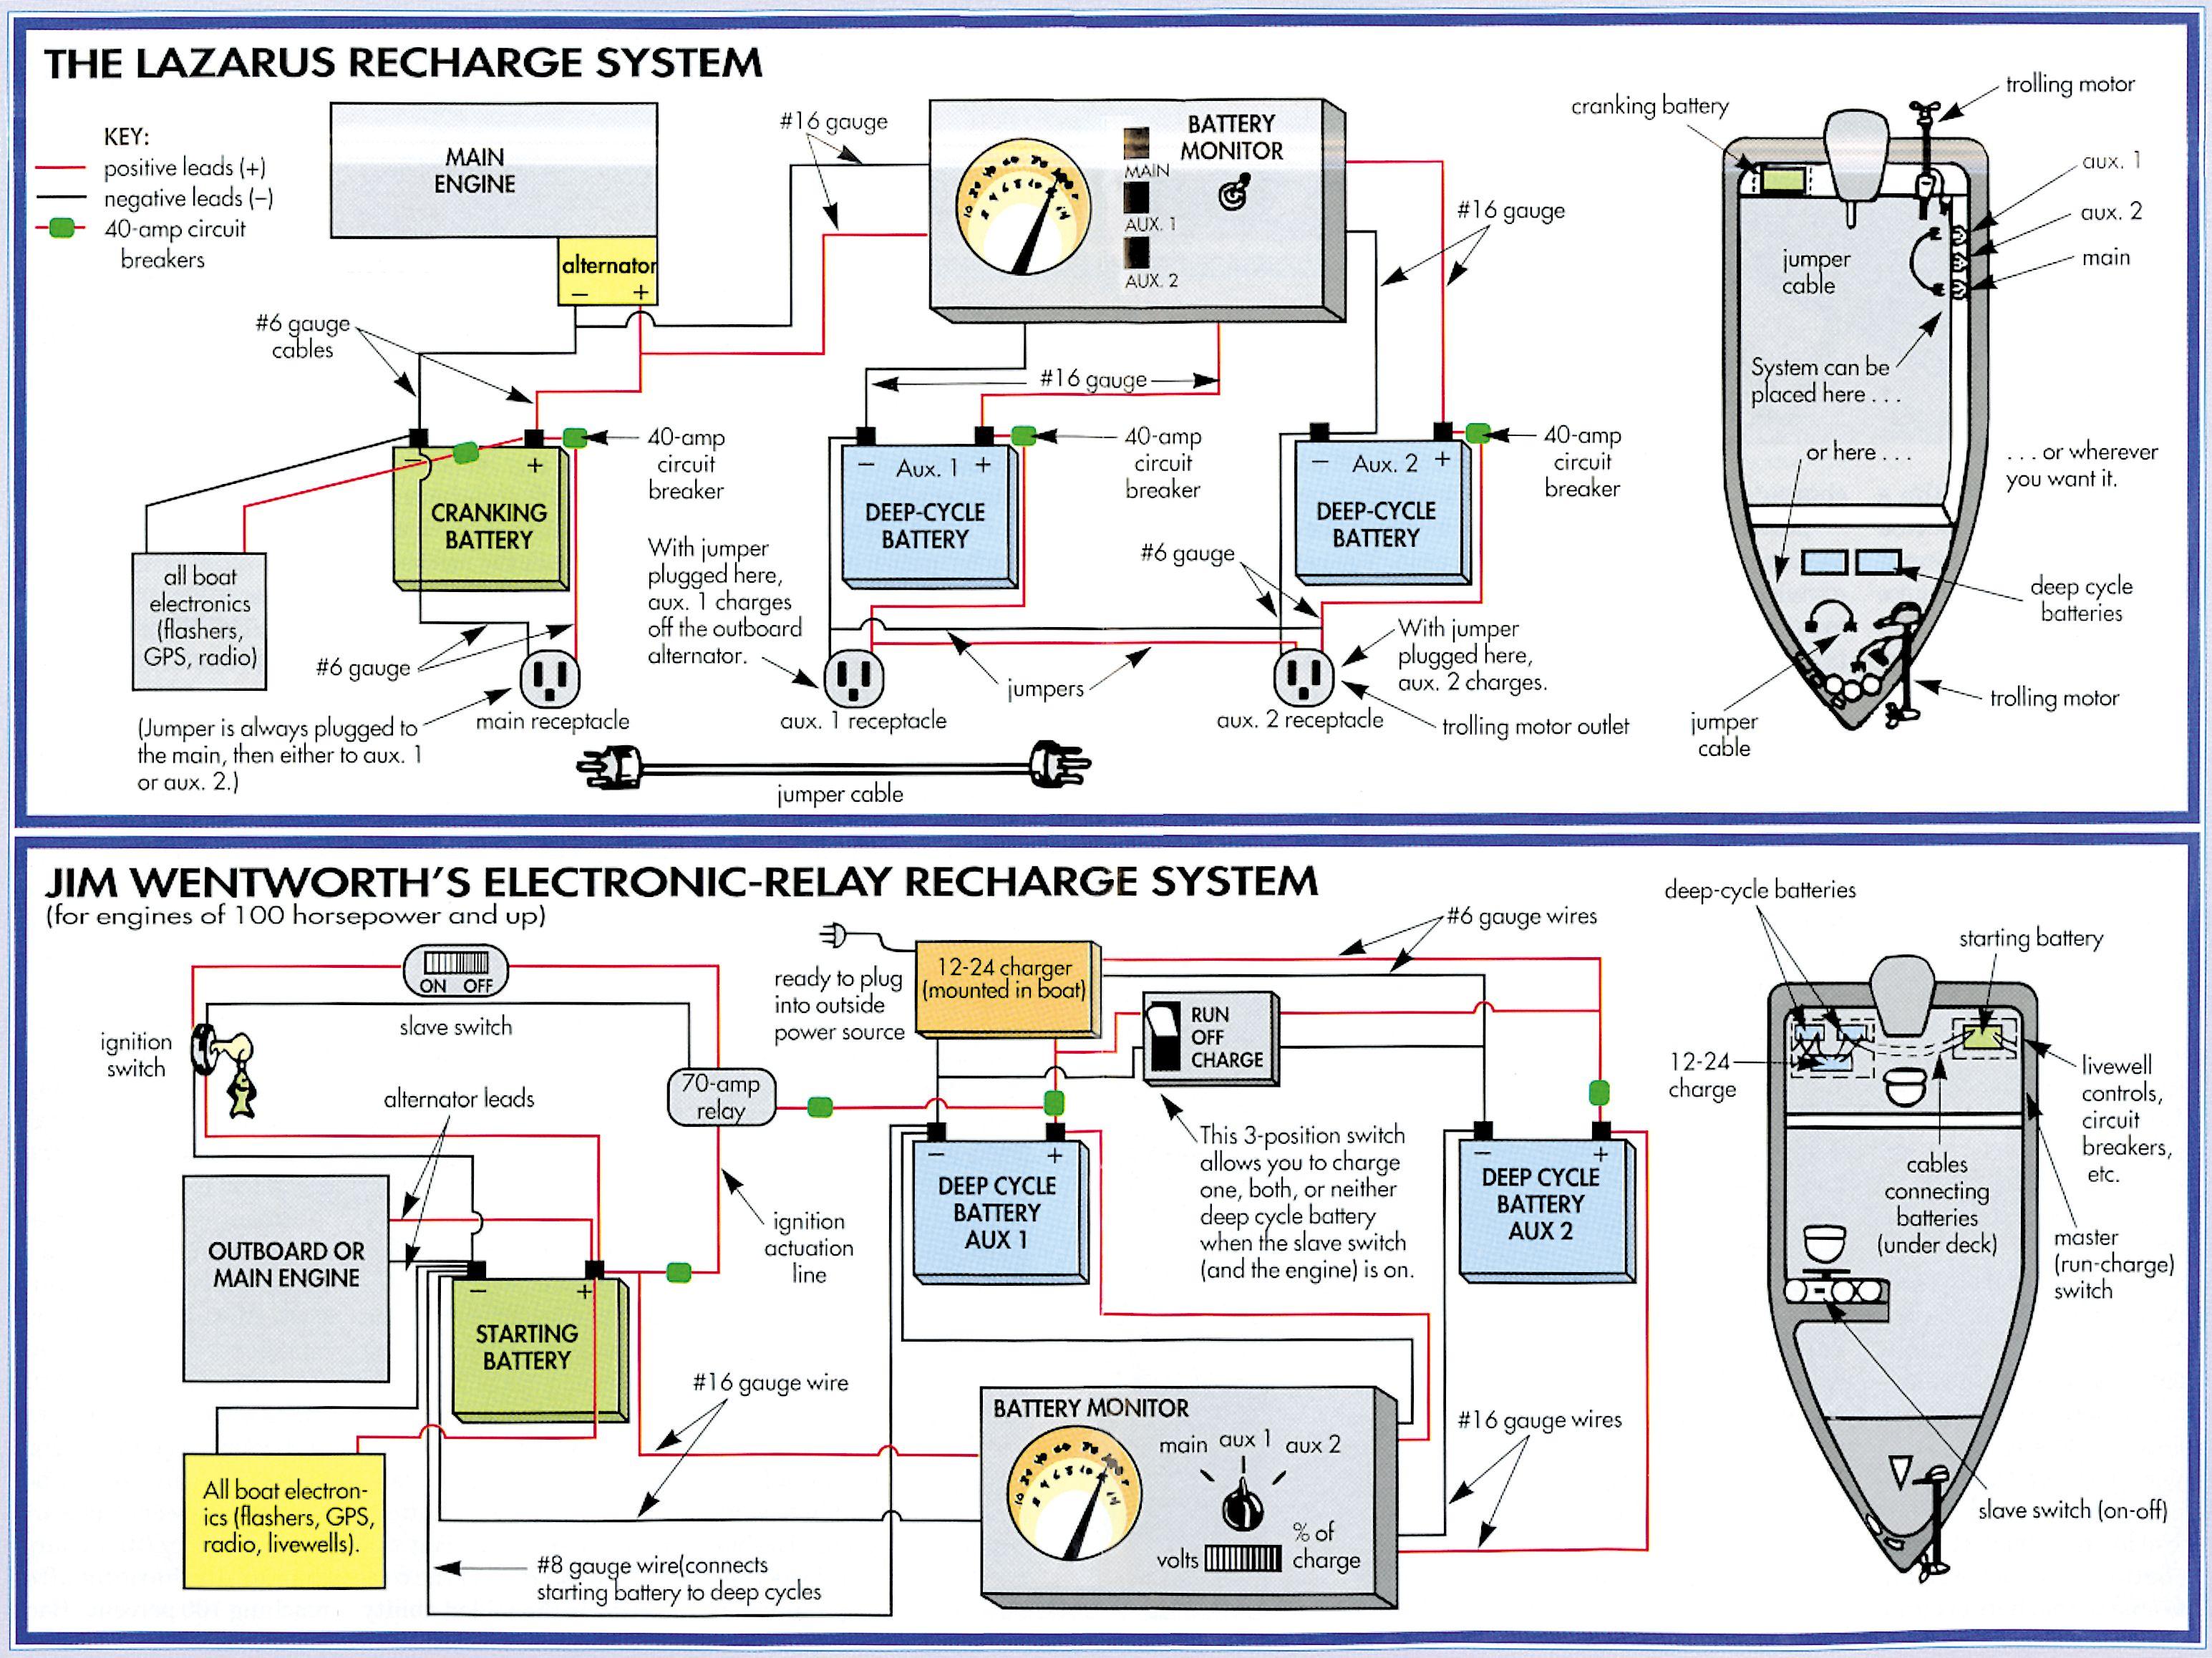 medium resolution of 12 24 trolling motor wiring motorguide volt and battery diagram 24 volt battery wiring diagram